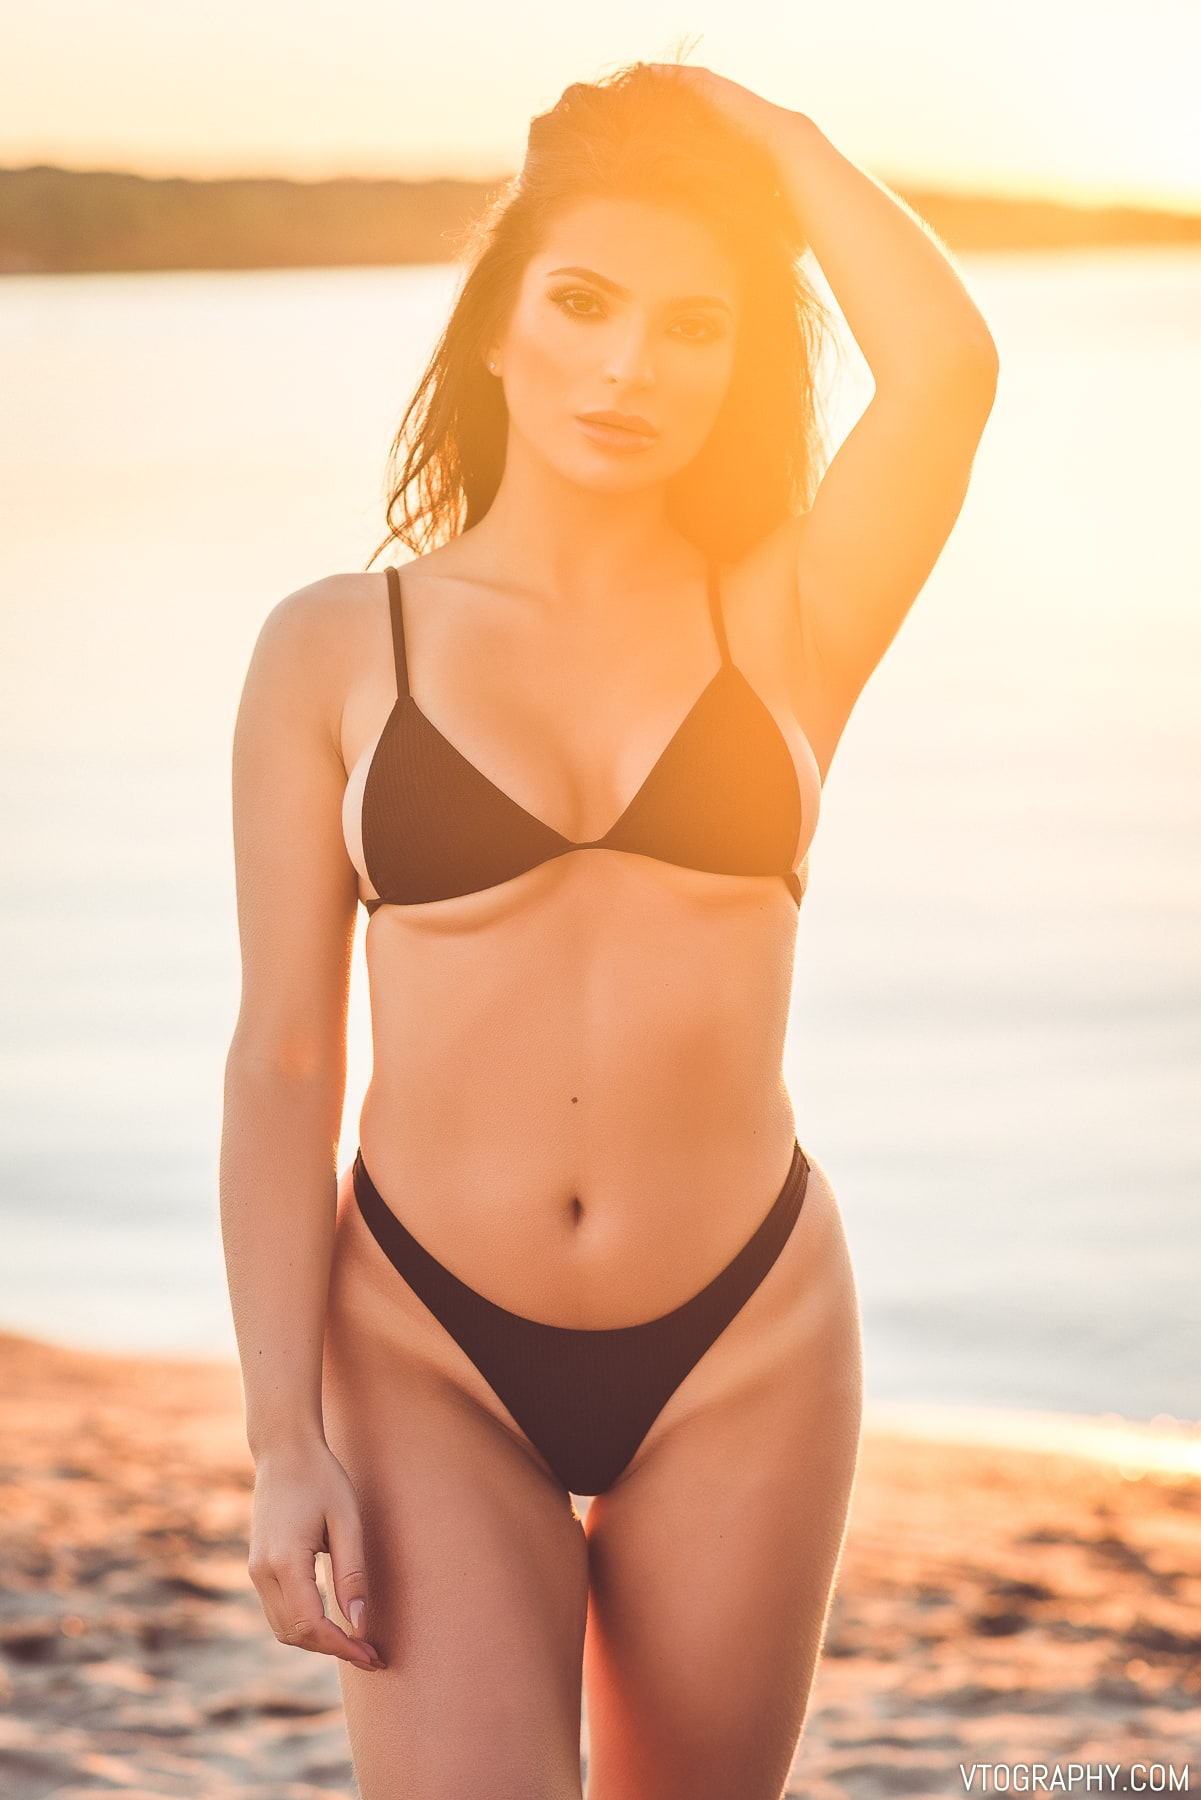 Brittany Webber (@brittanyrosewebber) Bikini Beach Photo Shoot